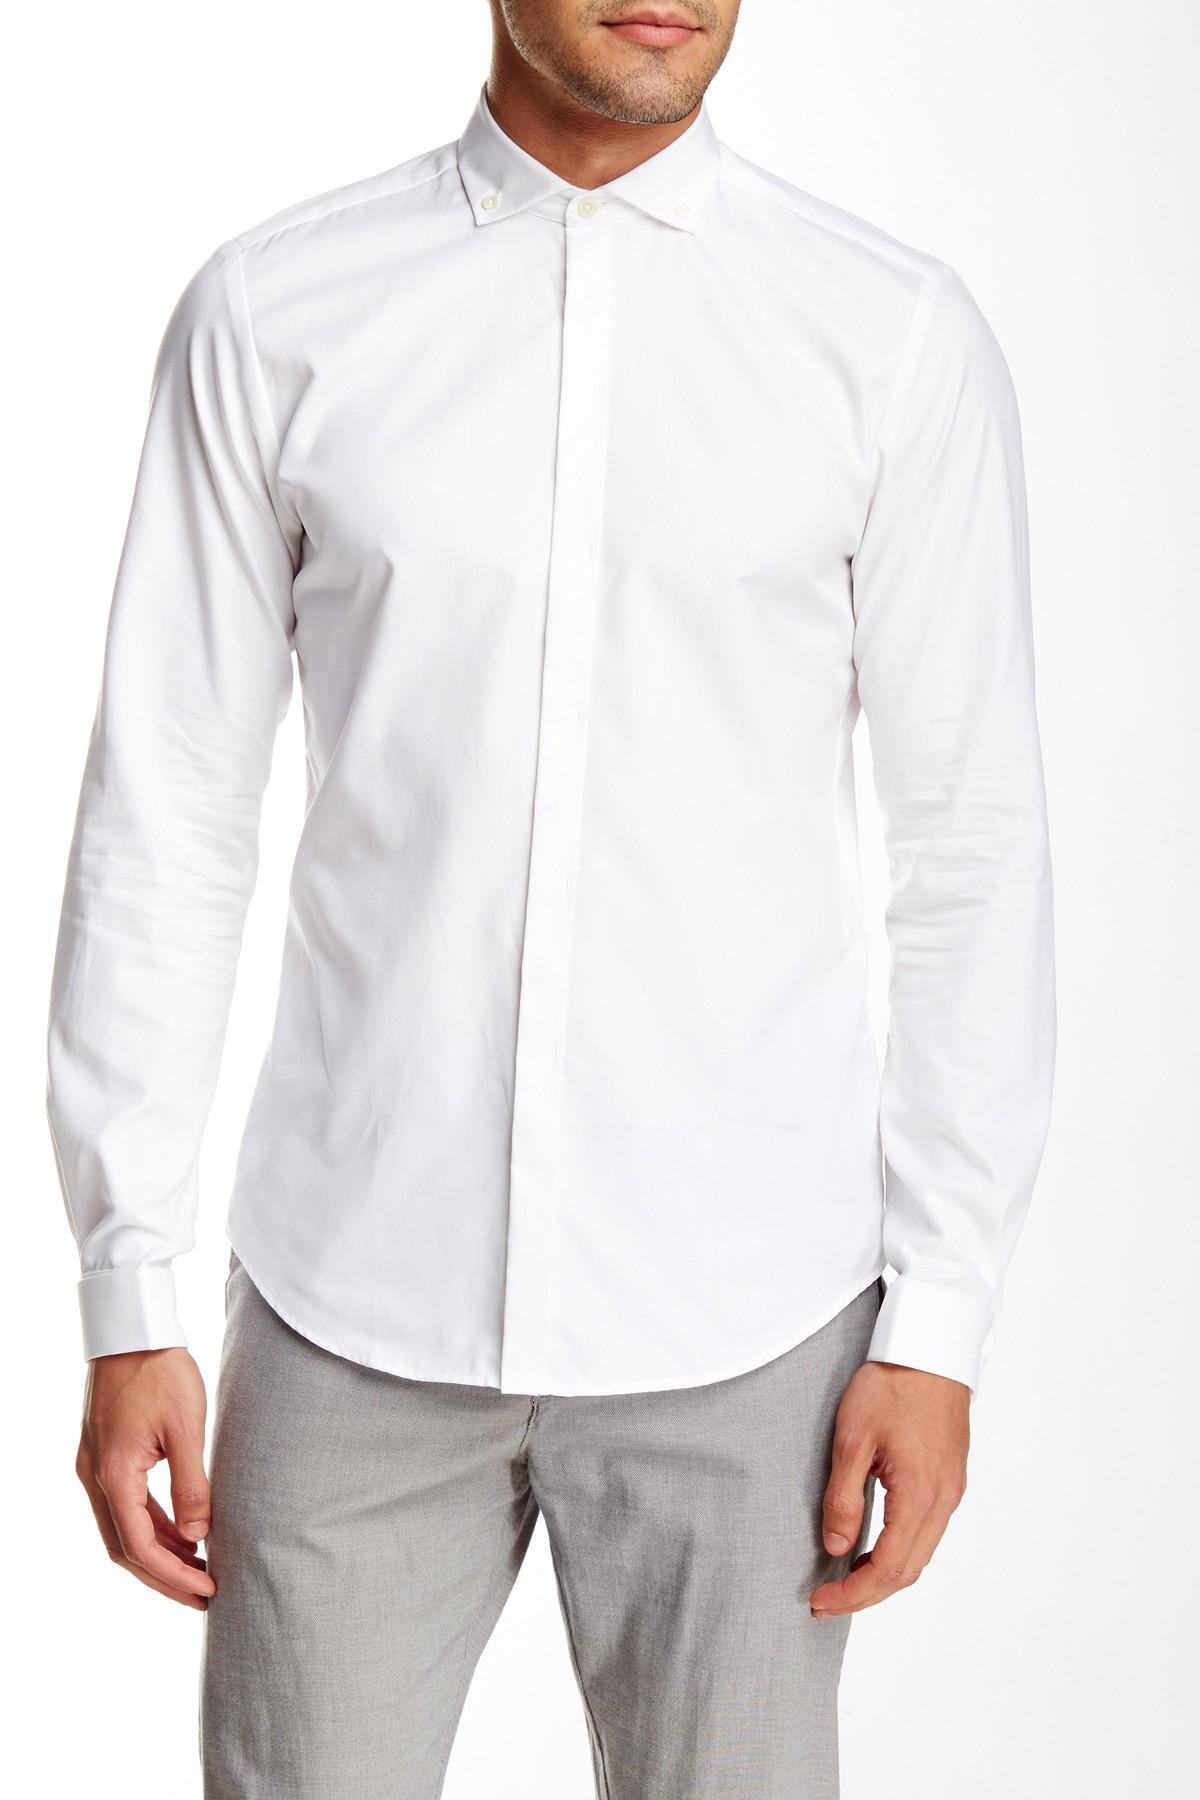 Ben sherman slim fit cutaway collar french cuff shirt in for White french cuff shirt slim fit